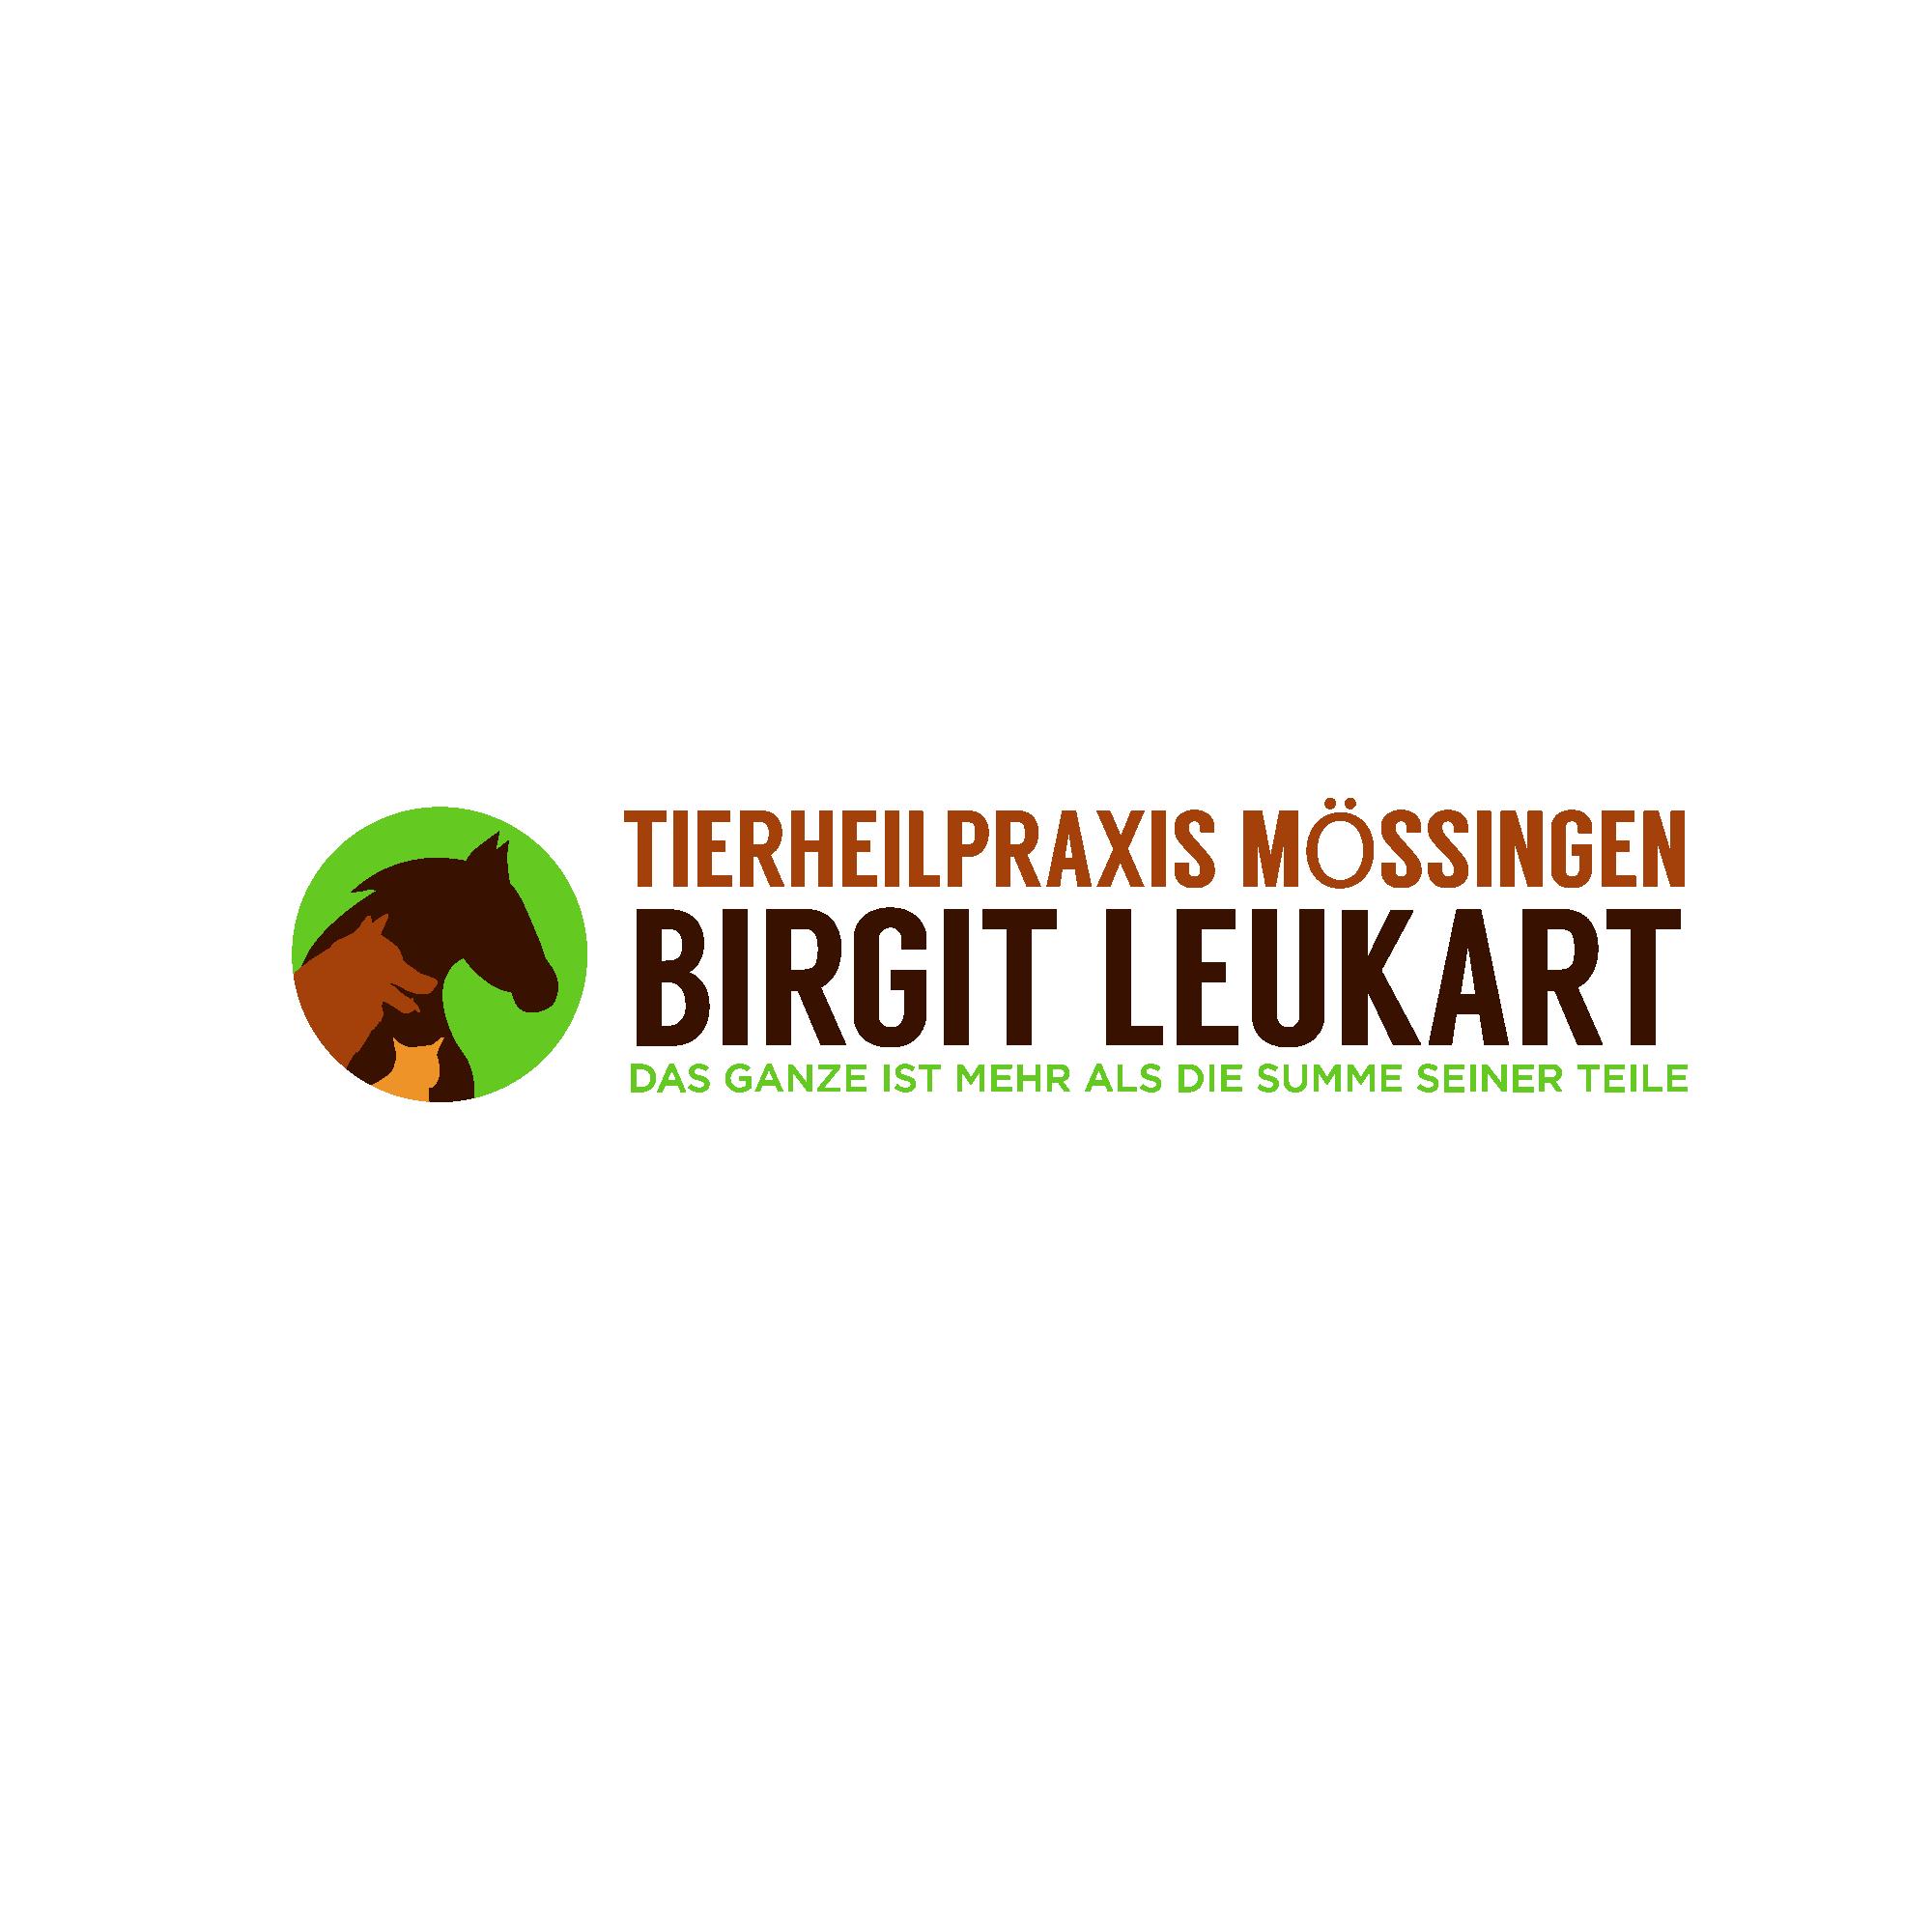 Tierheilpraxis Mössingen